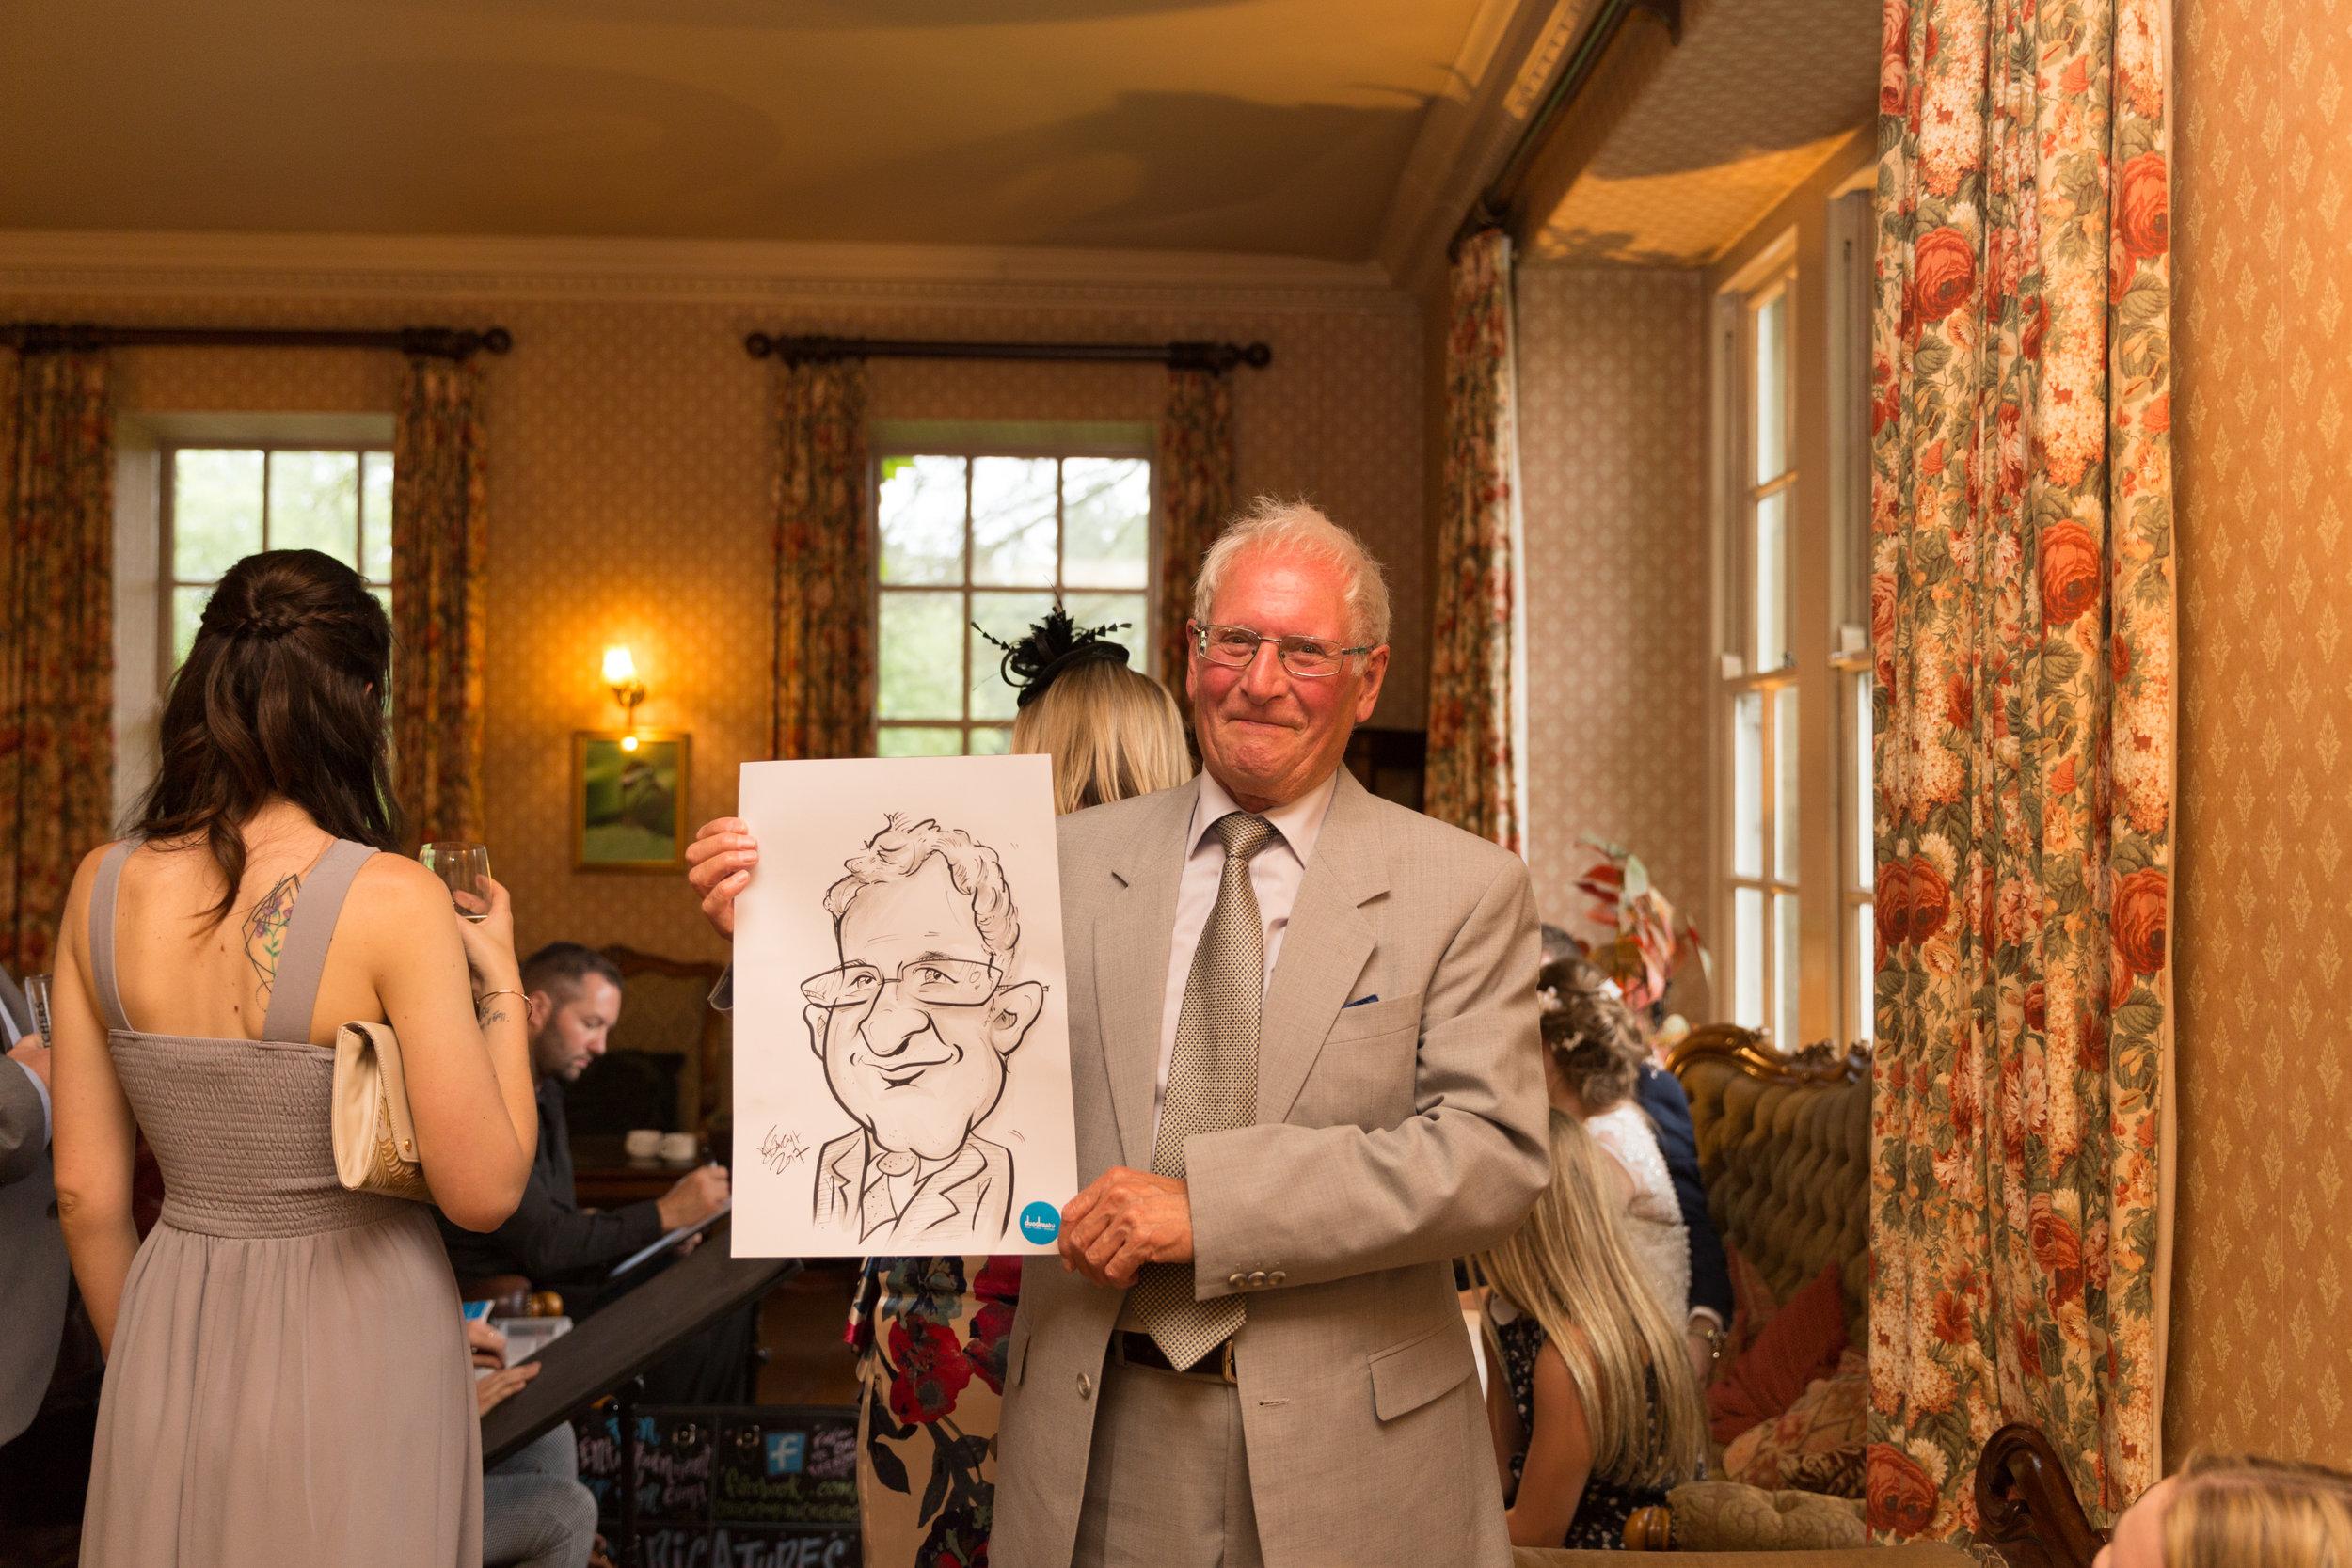 wedding-caricature-man.jpg